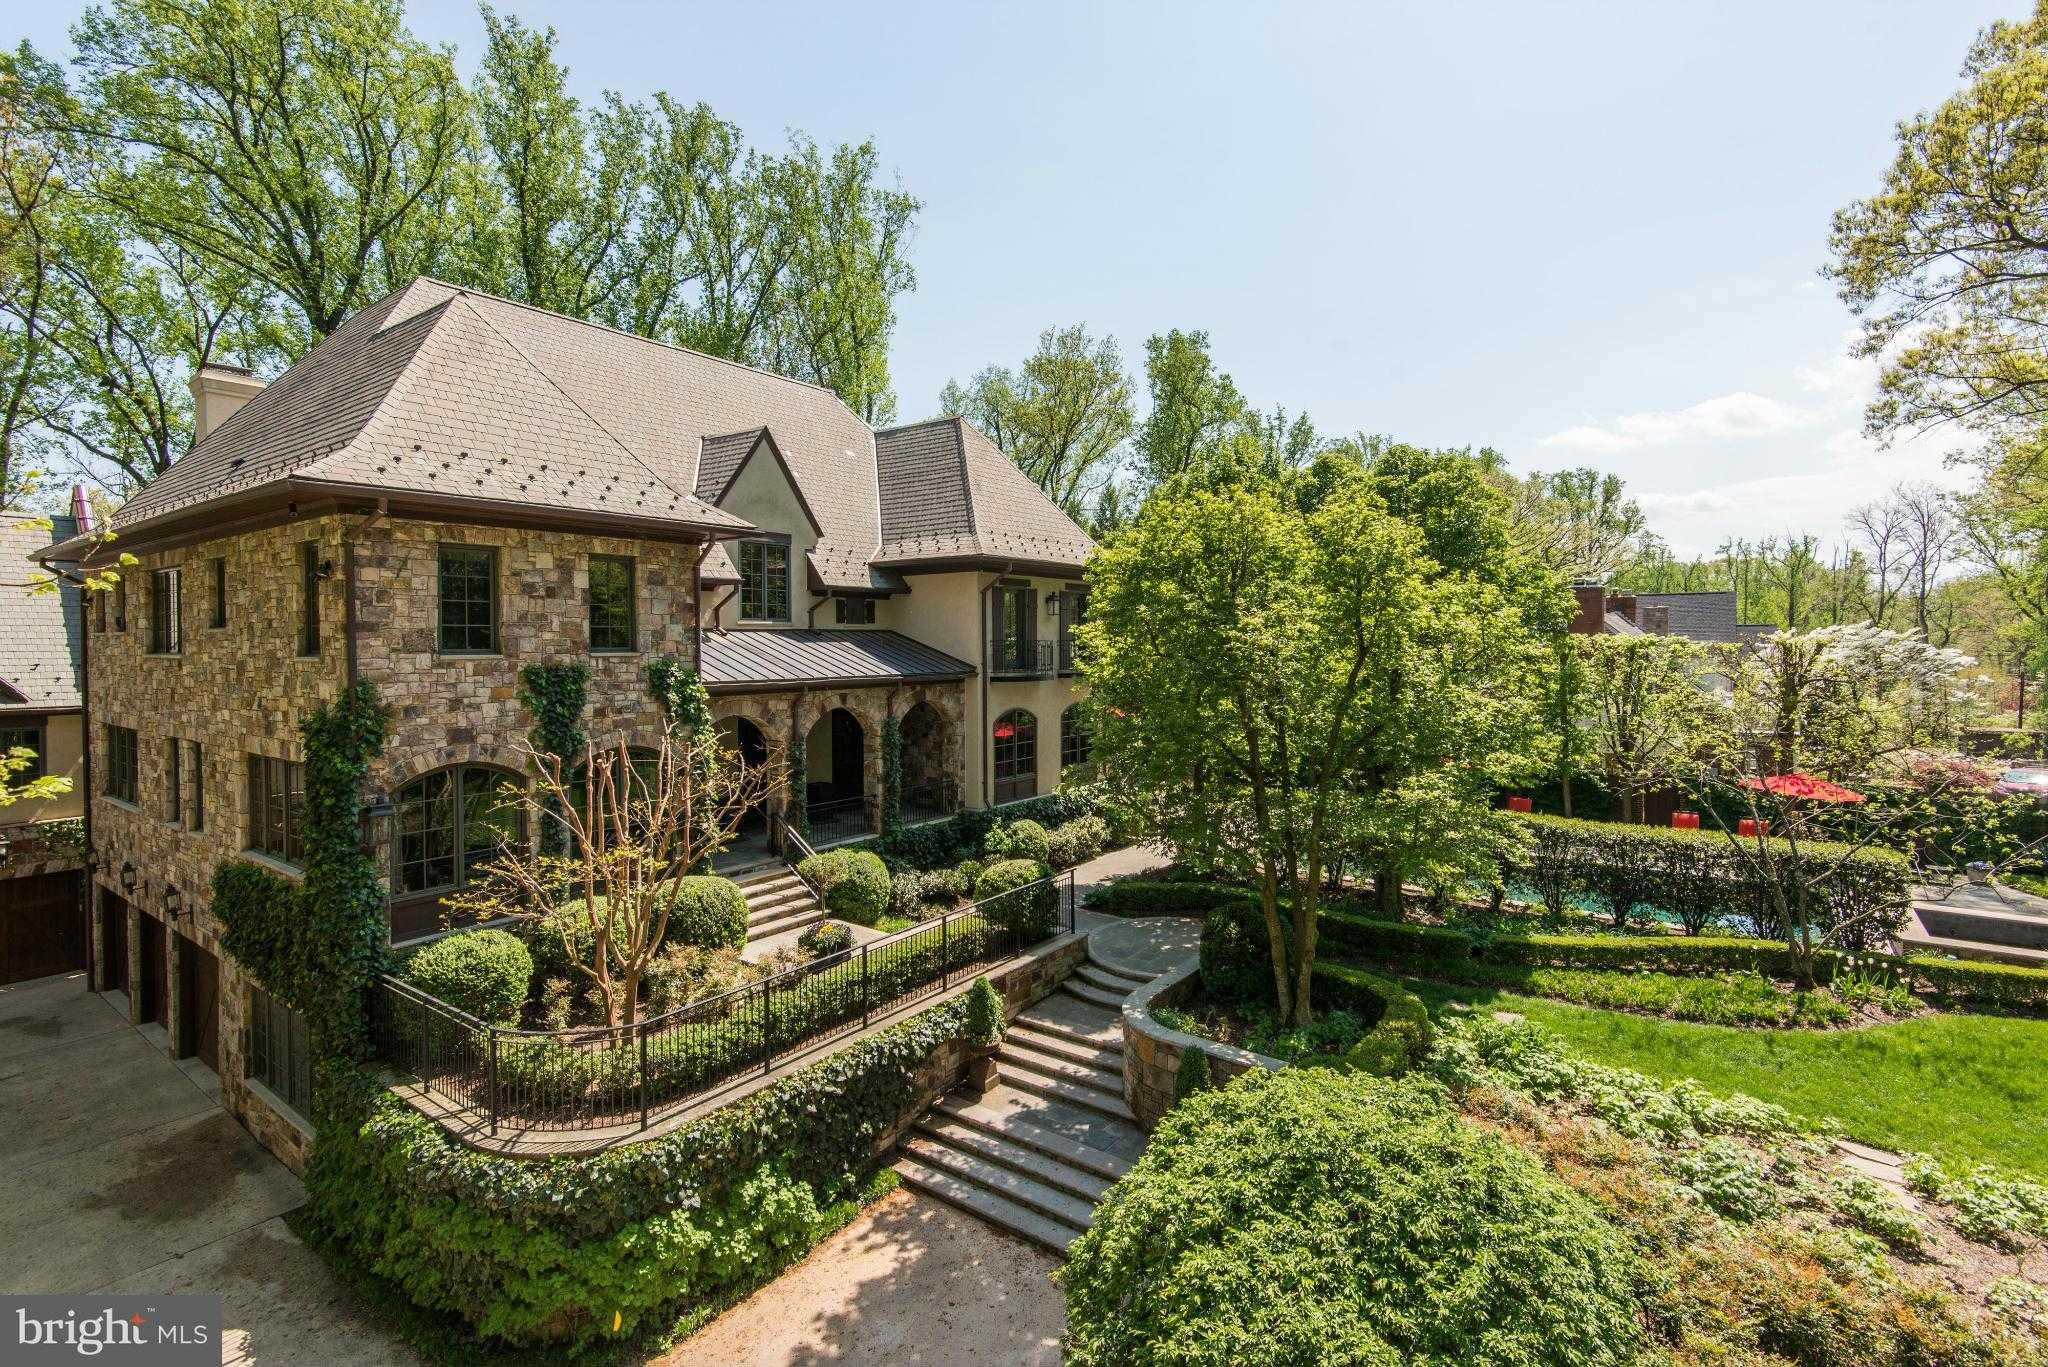 Homes for Sale in Walt Whitman District - Josh Ross